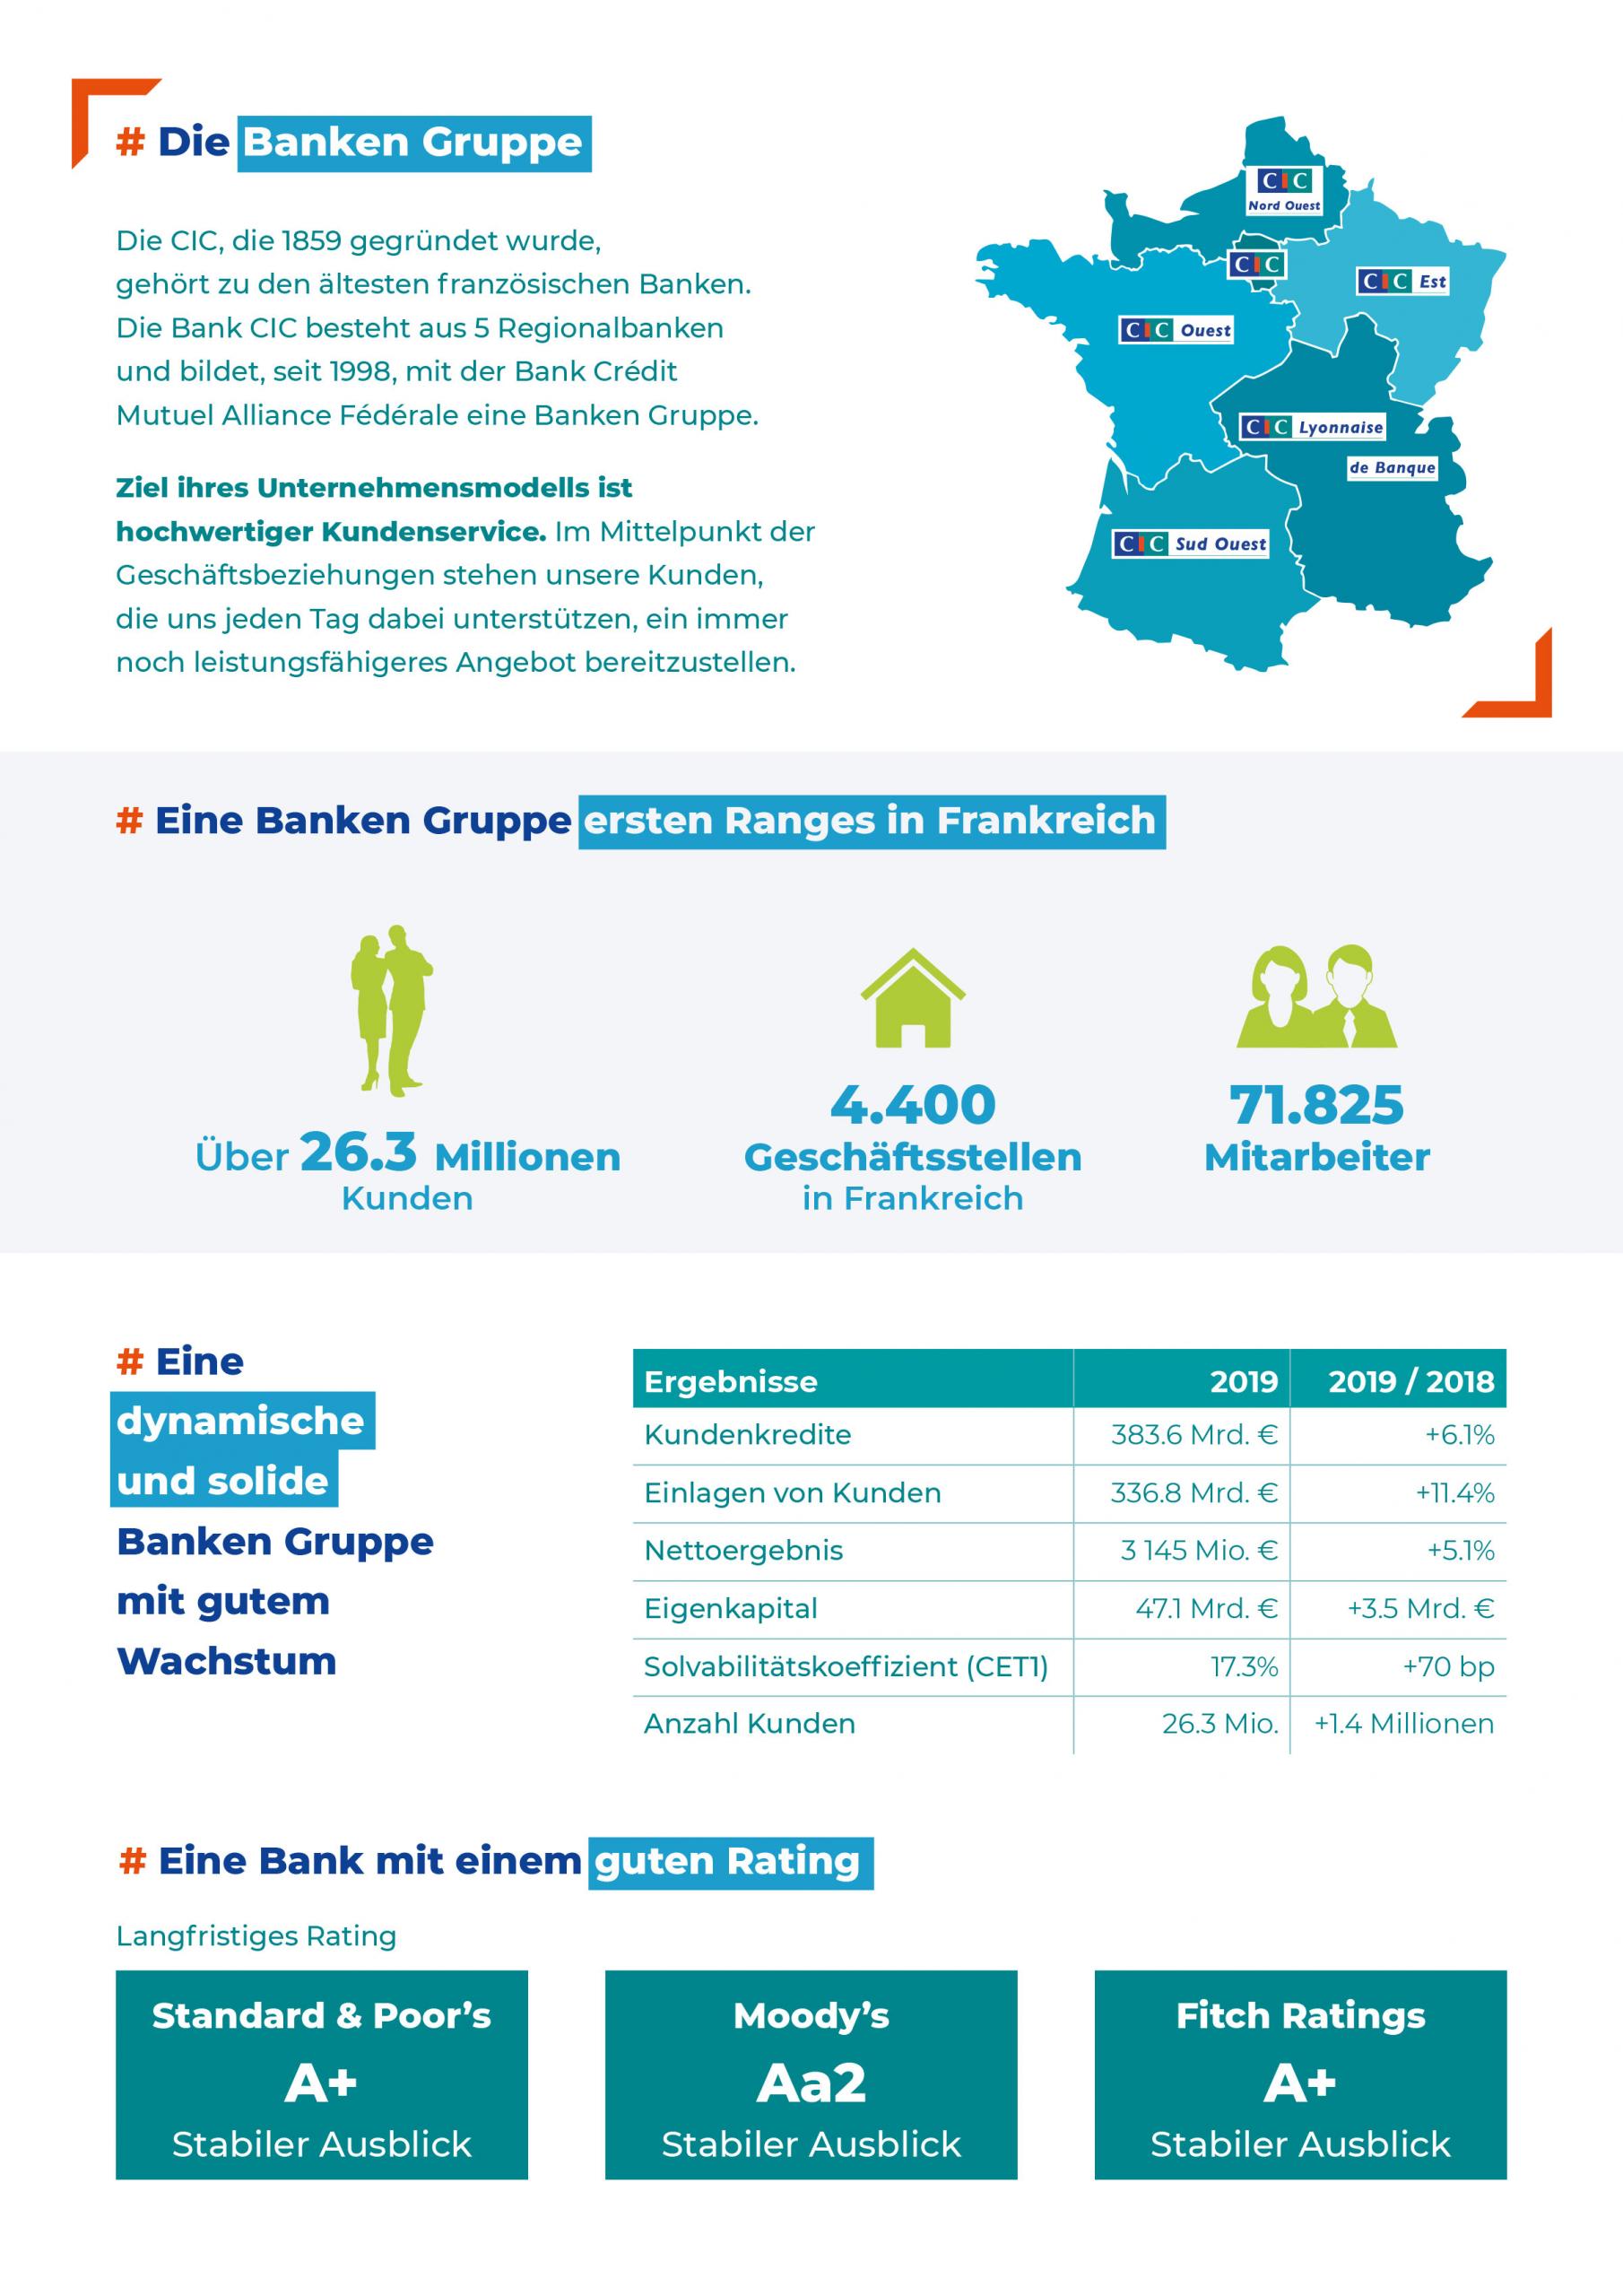 CIC Est Entreprises Europe - französische Bank